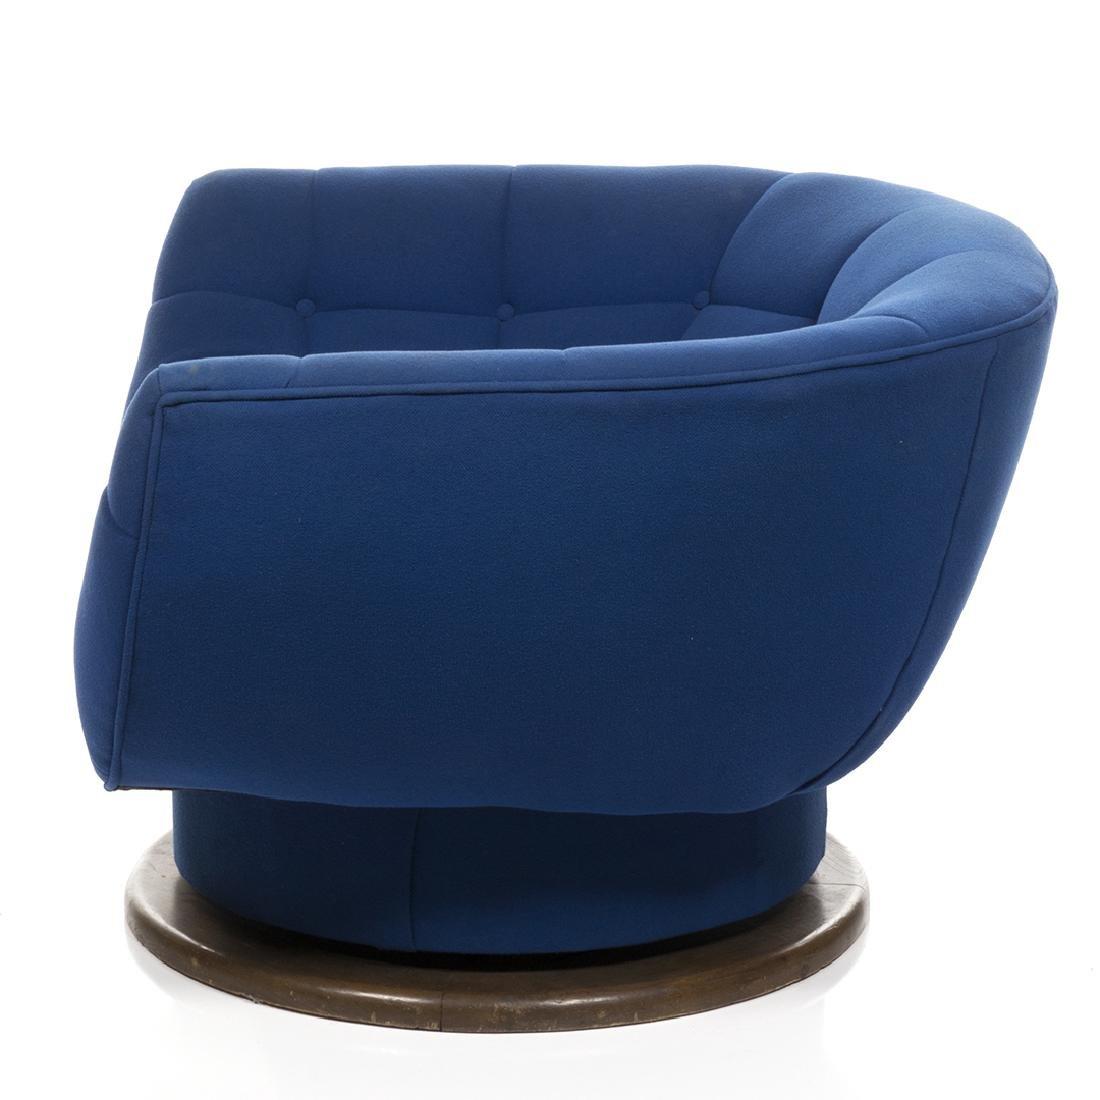 Monumental Adrian Pearsall Swivel Lounge Chair - 3